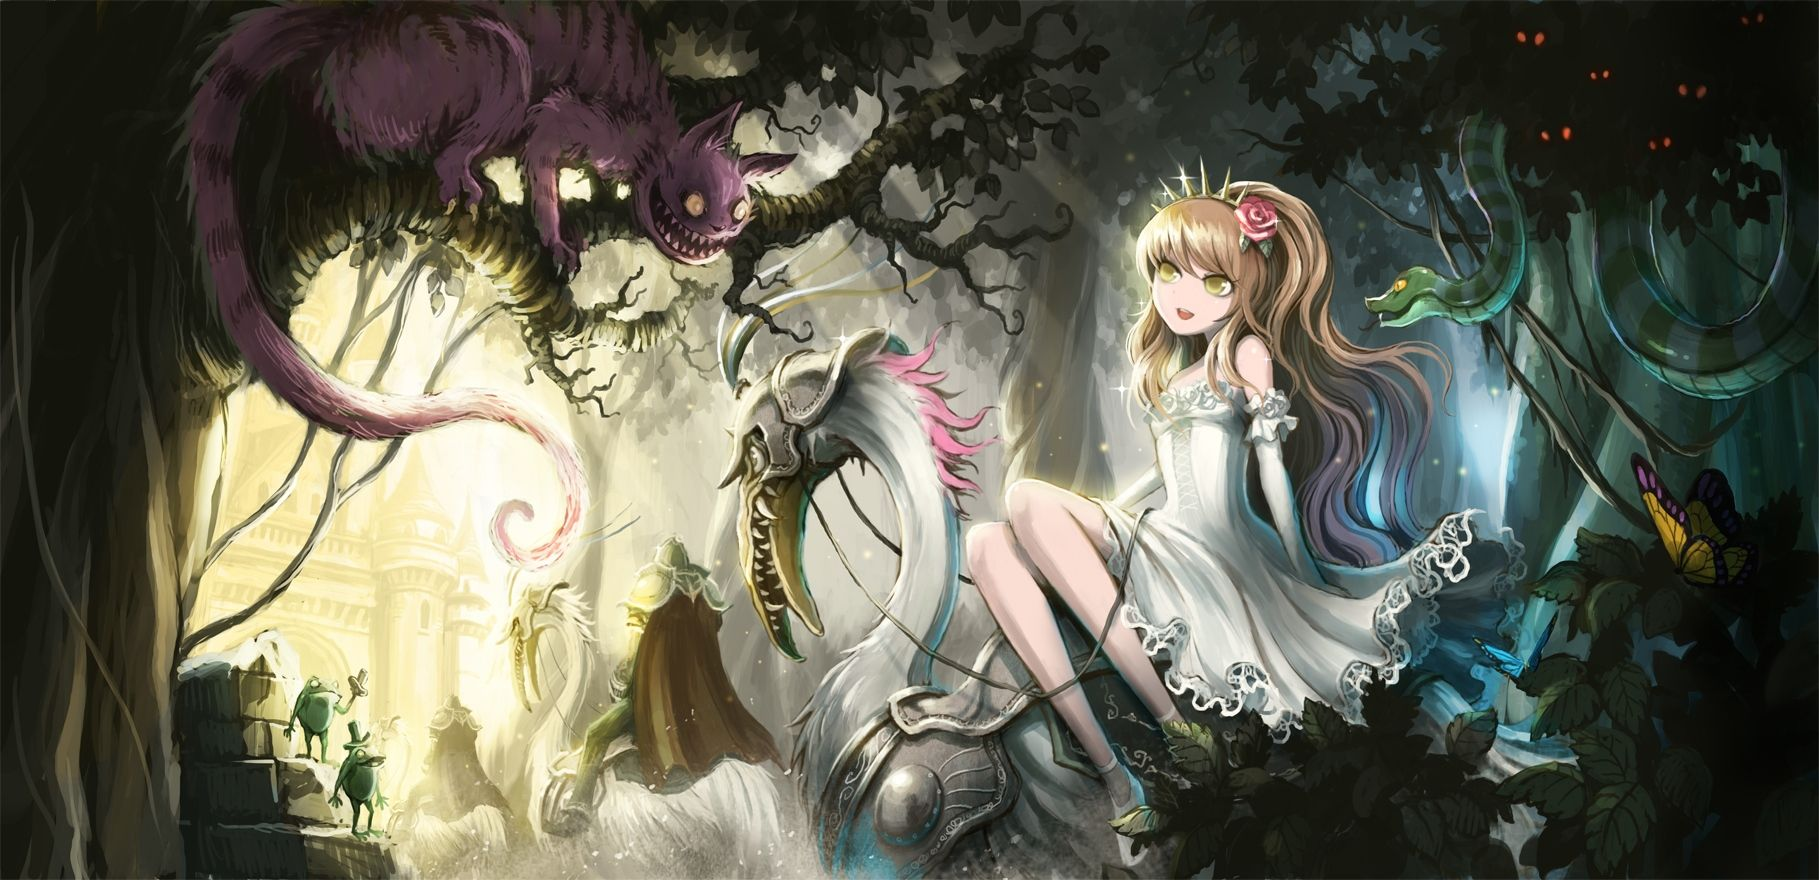 Anime Alice In Wonderland Wallpaper Favorites